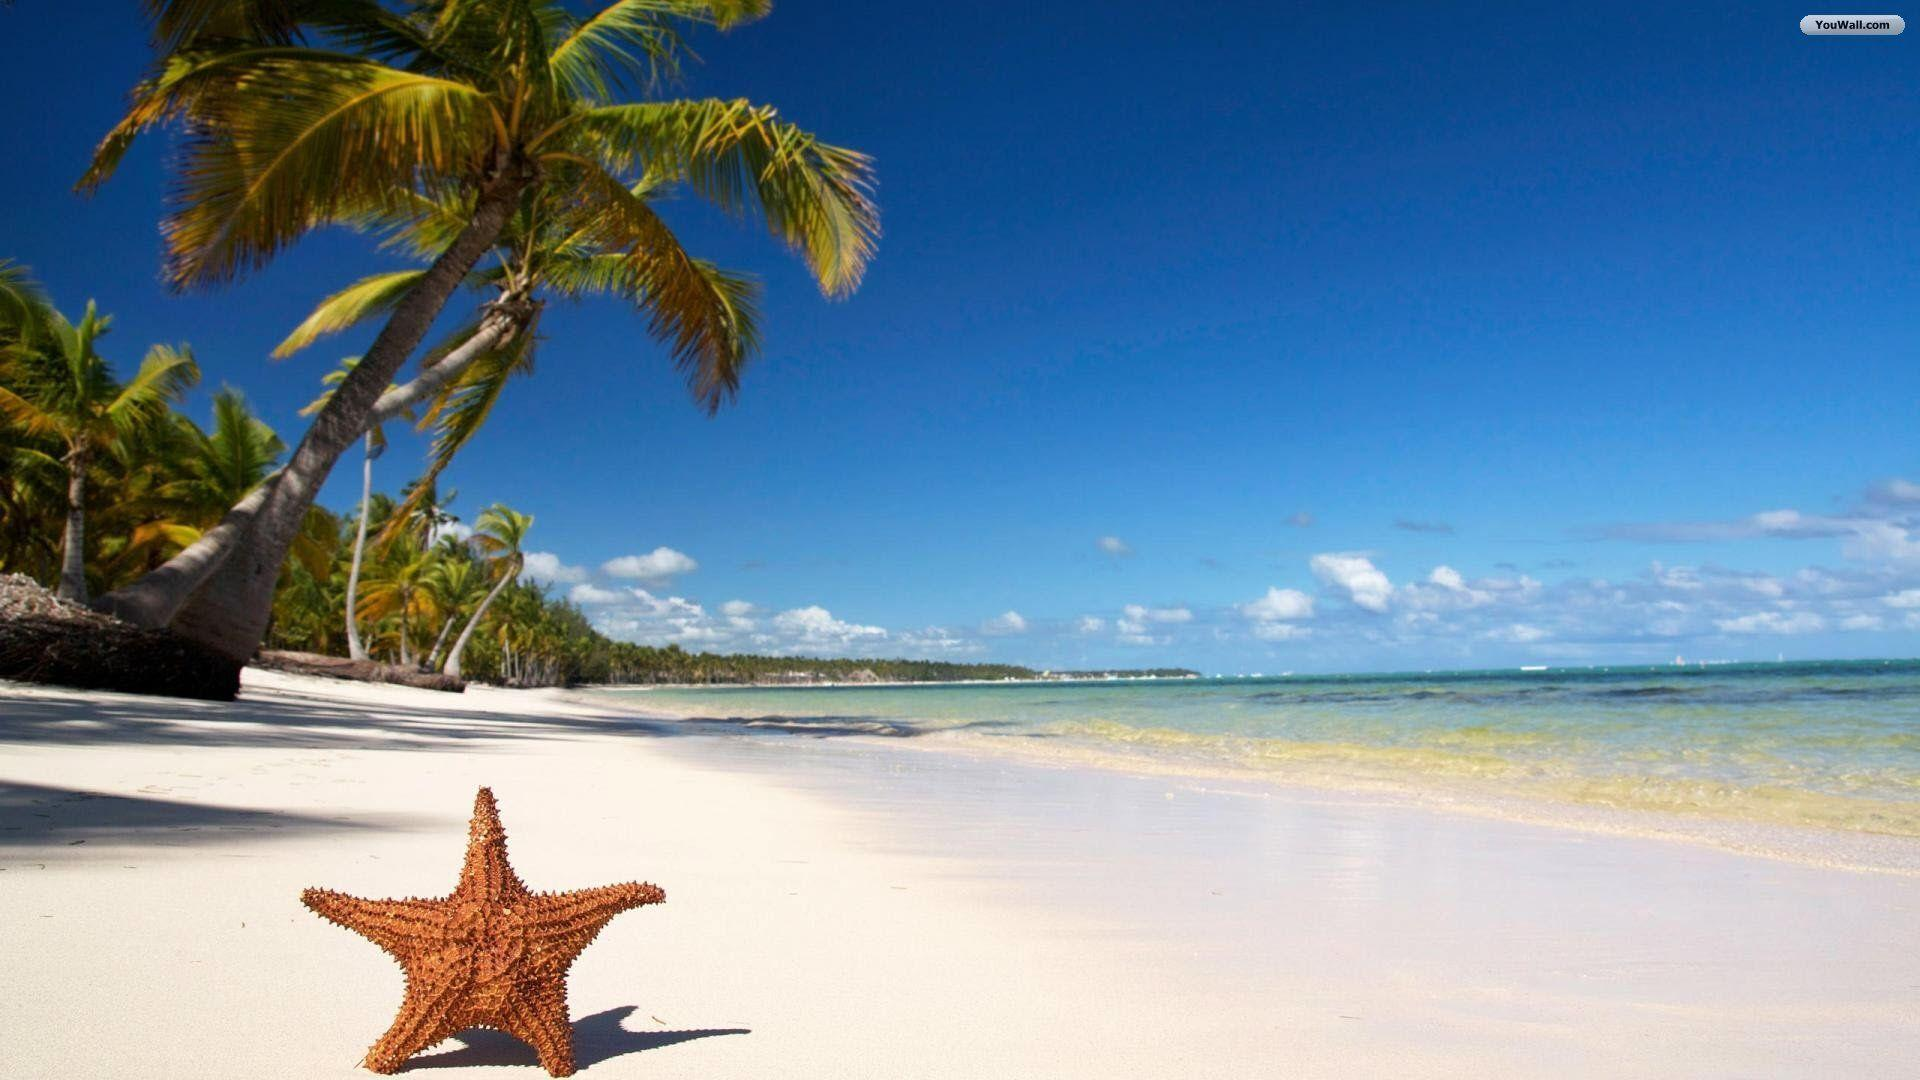 Hd Tropical Island Beach Paradise Wallpapers And Backgrounds: Free Tropical Beach Wallpapers